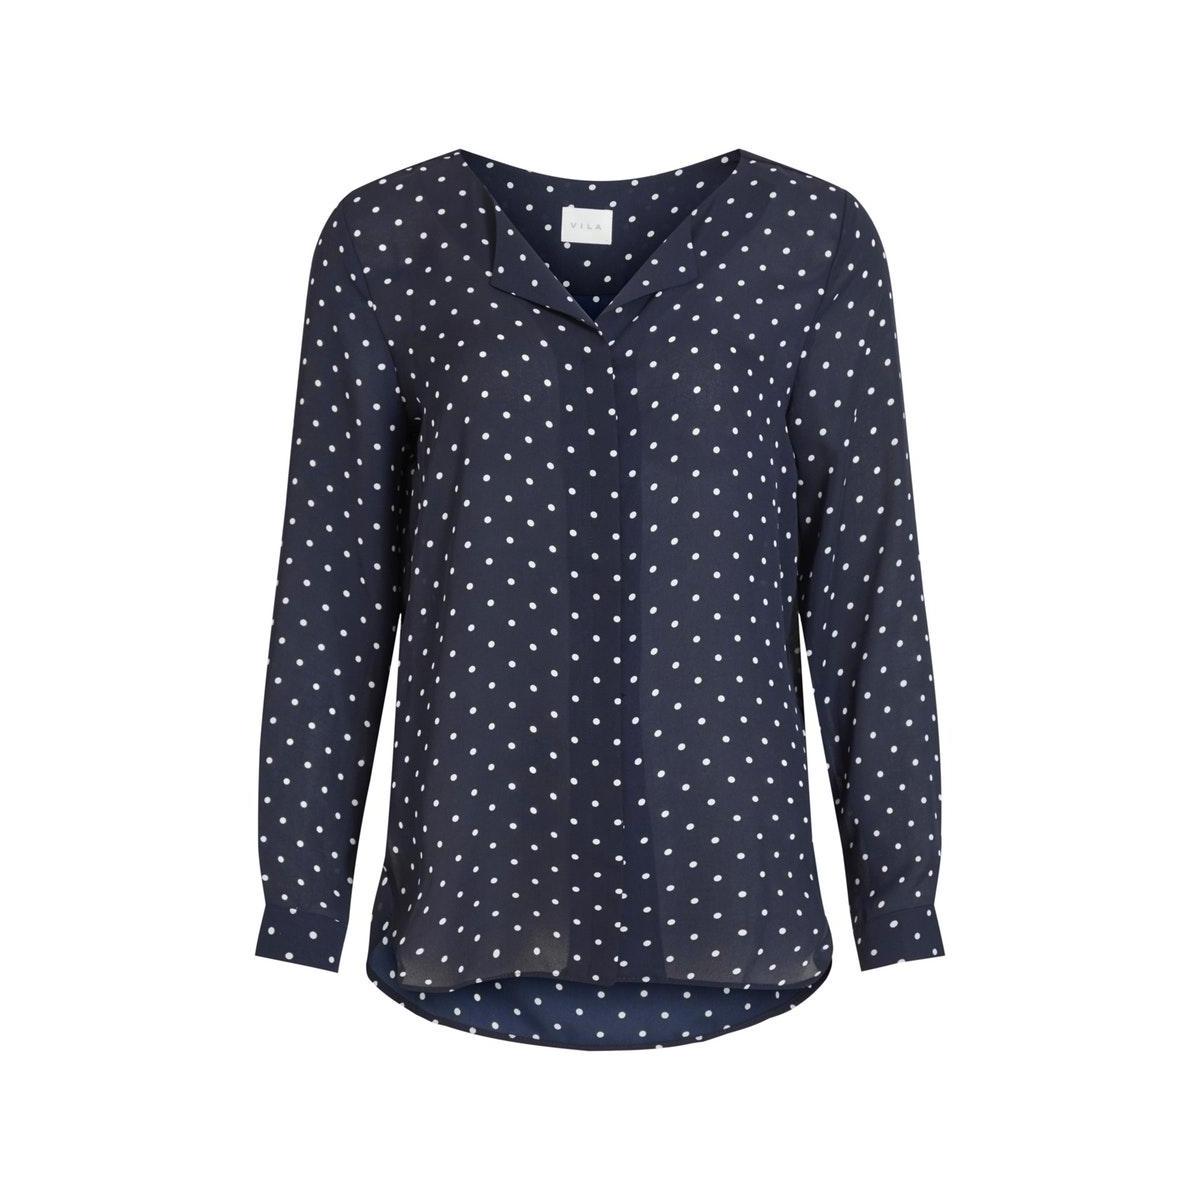 vilucy l/s shirt - fav lux 14049450 vila blouse navy blazer/snow white